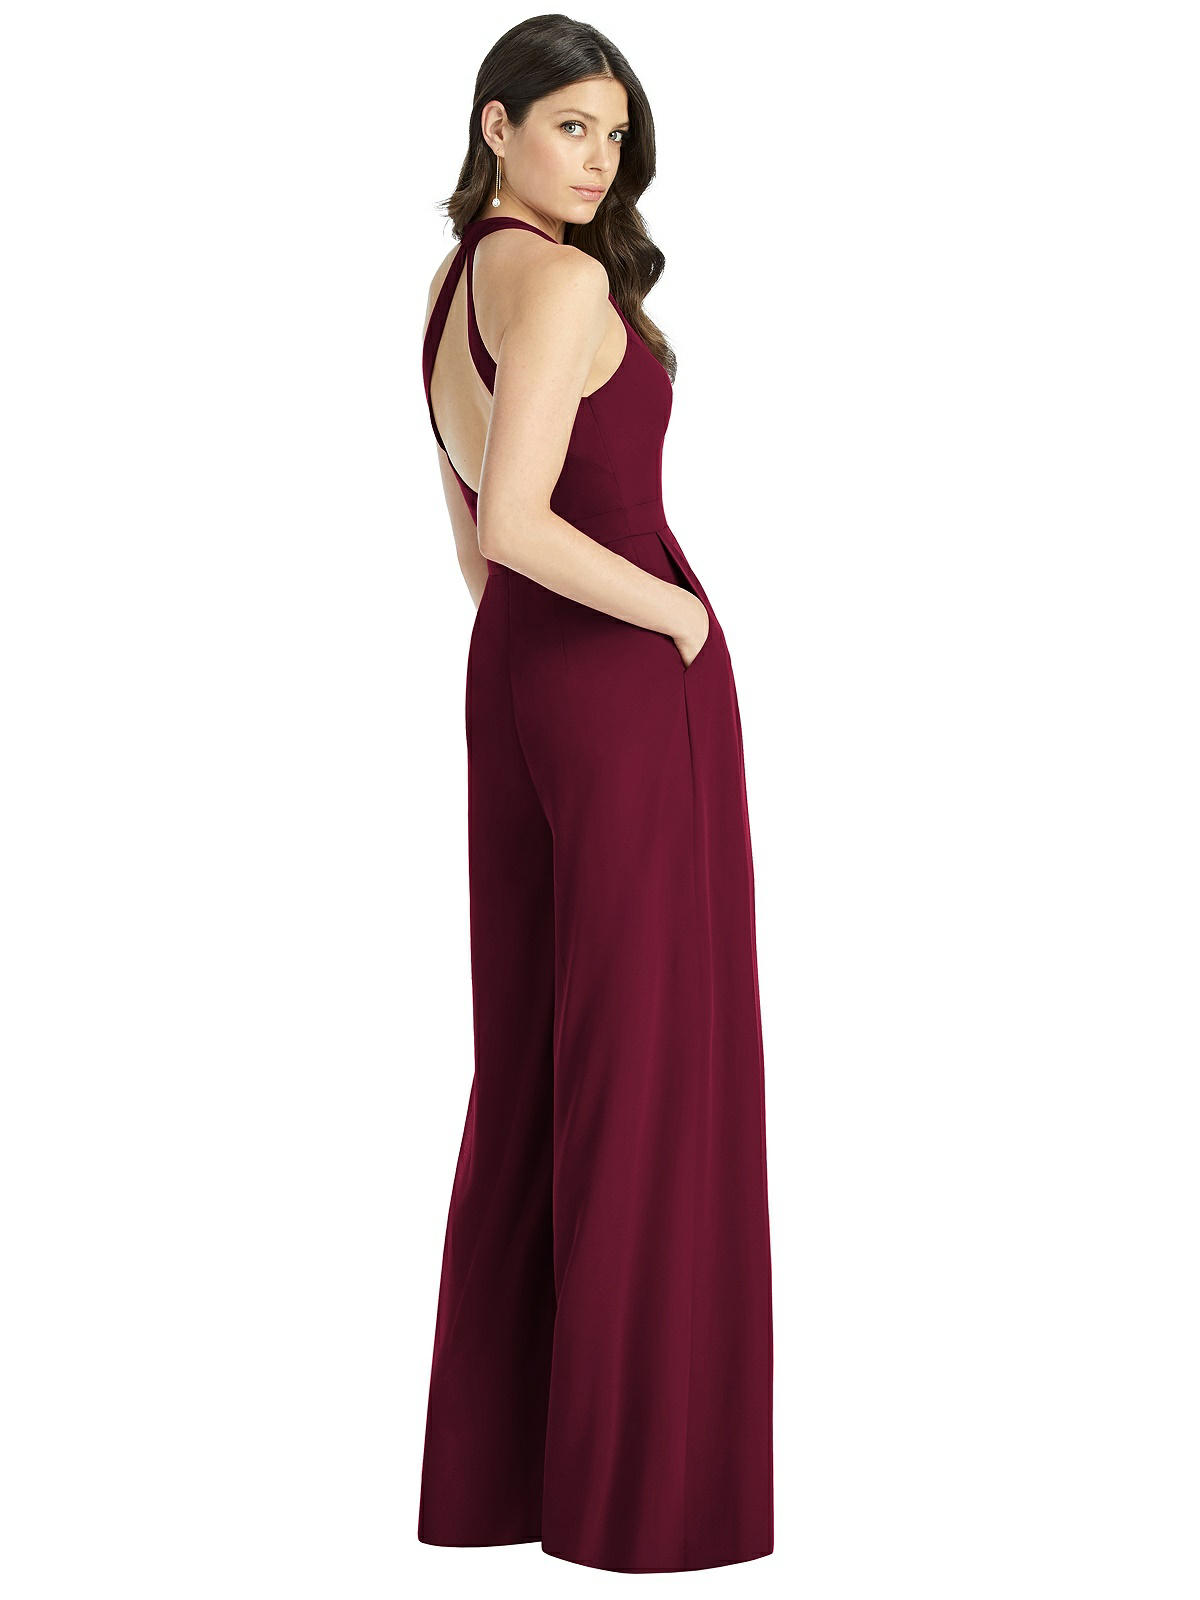 Cabernet Red Bridesmaids Dress